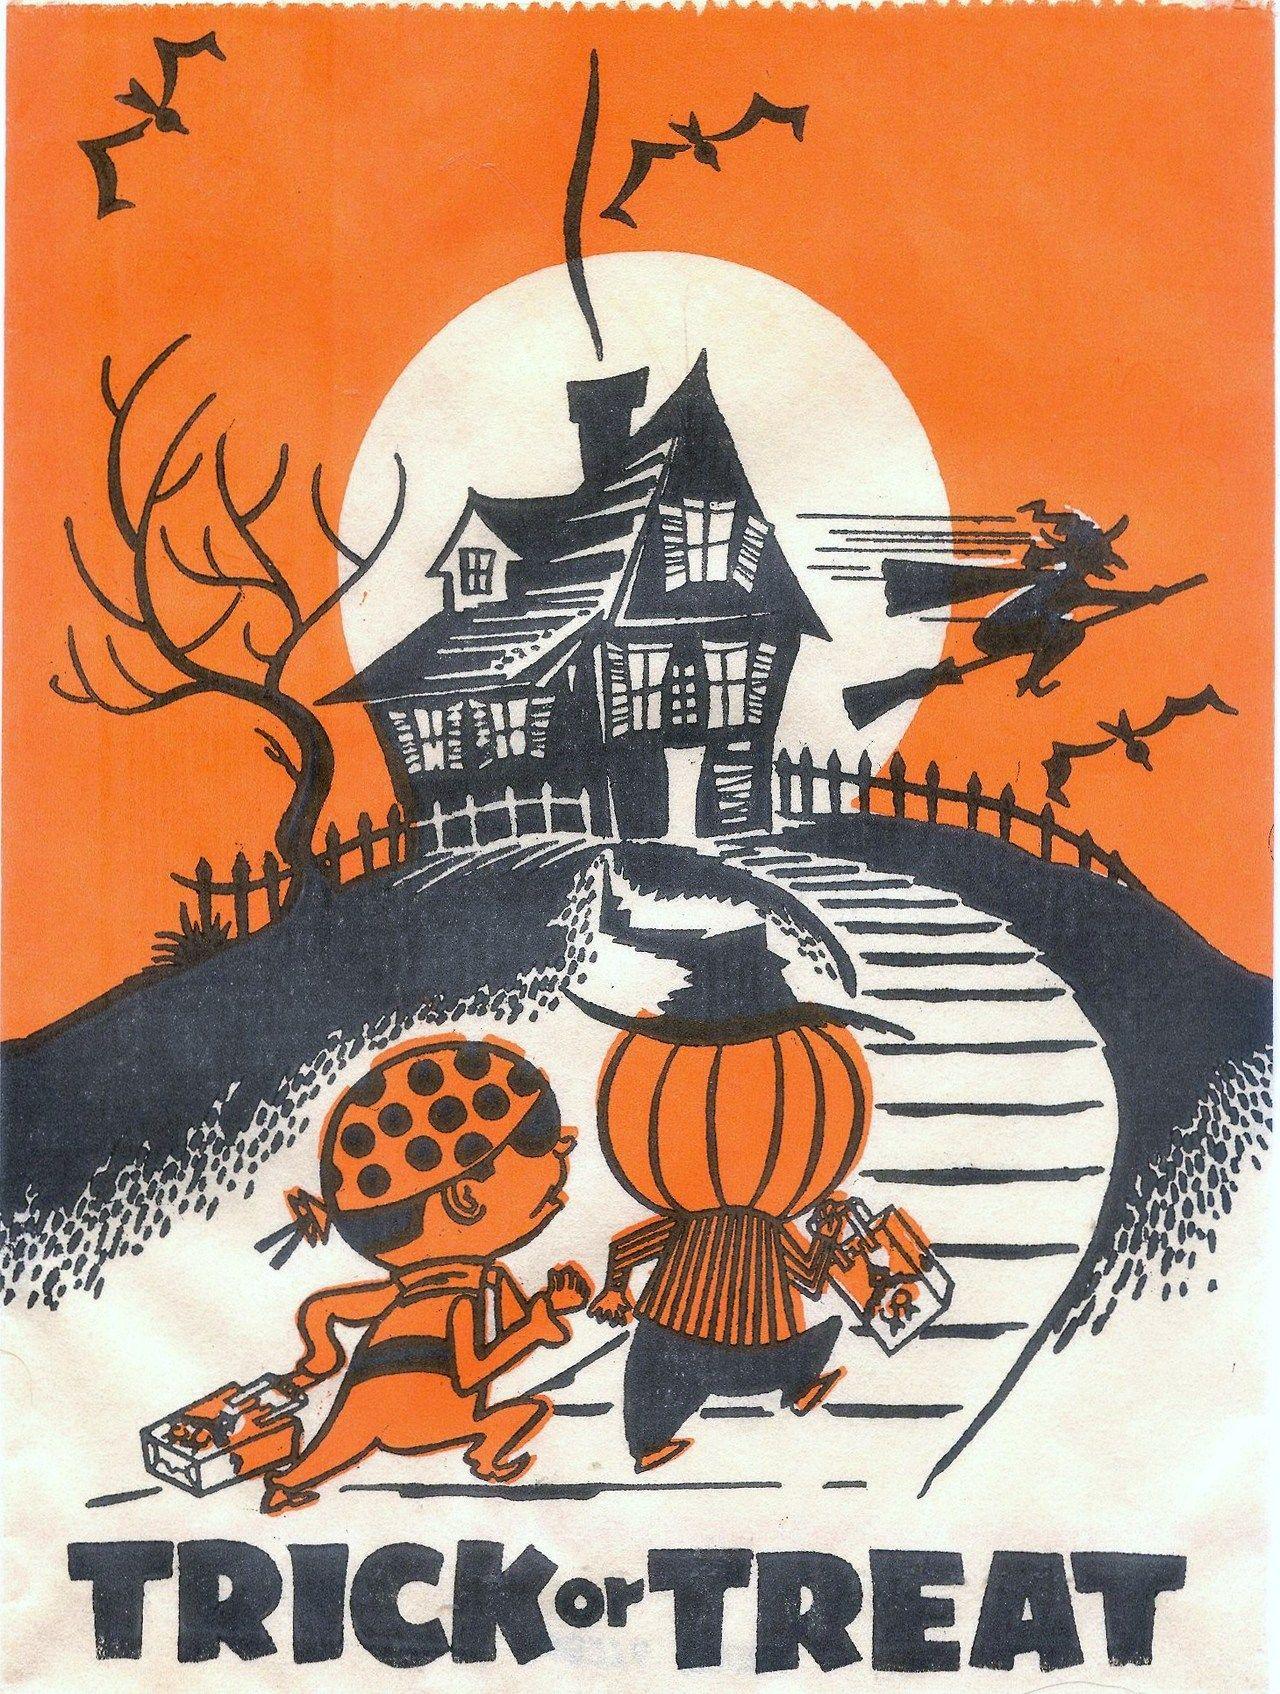 Trick or Treat Halloween candy bag. Vintage halloween